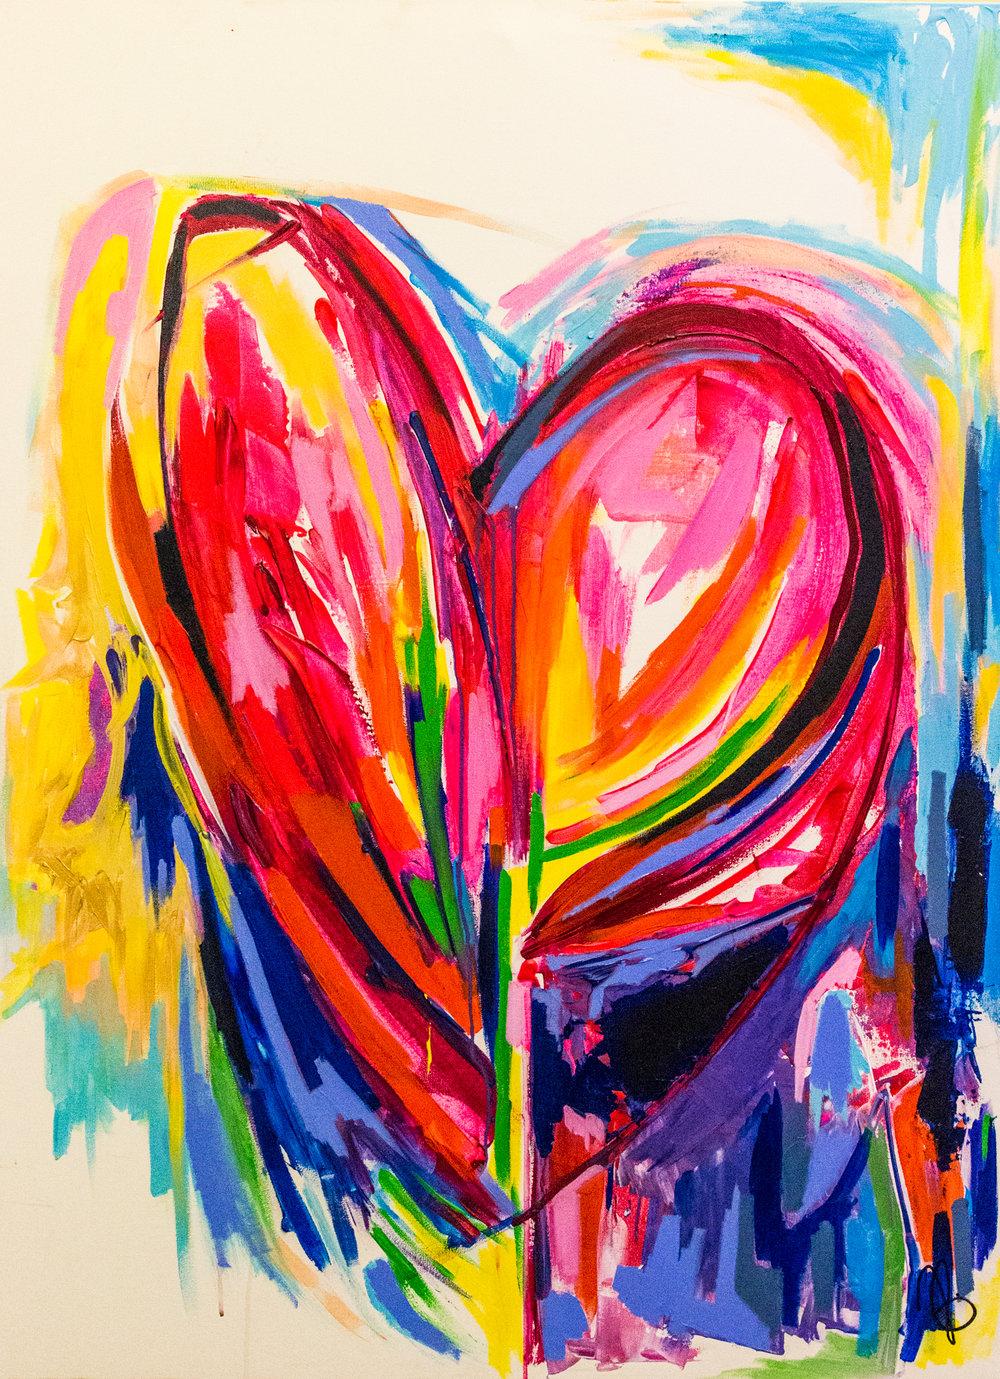 One Heart /  48 x 36 / Acrylic / 2016 /  SOLD